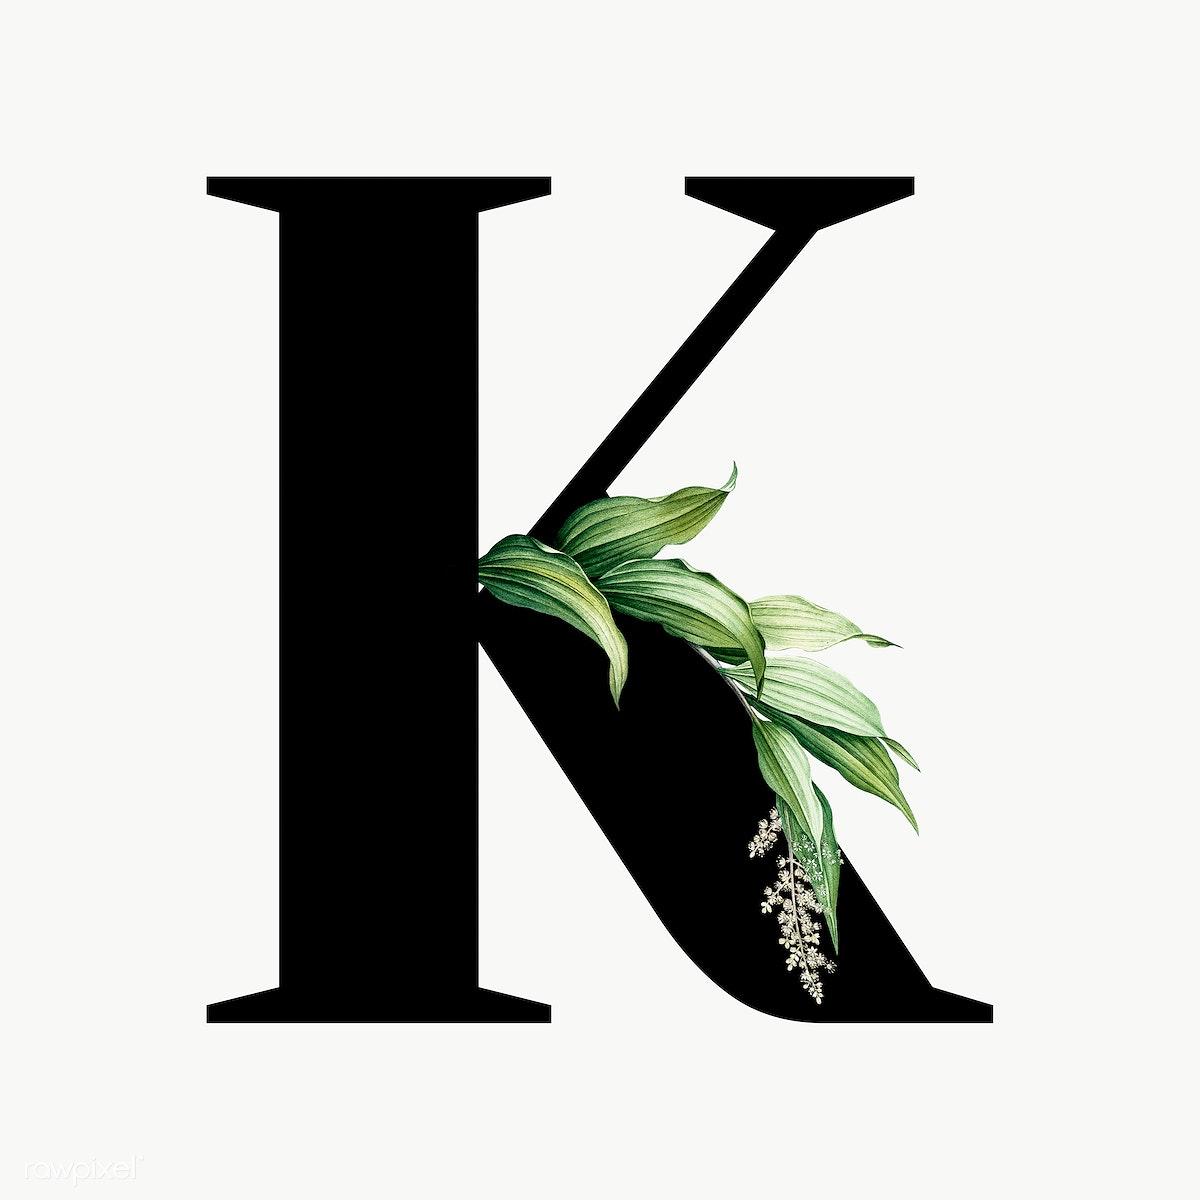 Download premium png of Botanical capital letter K transparent png 584898